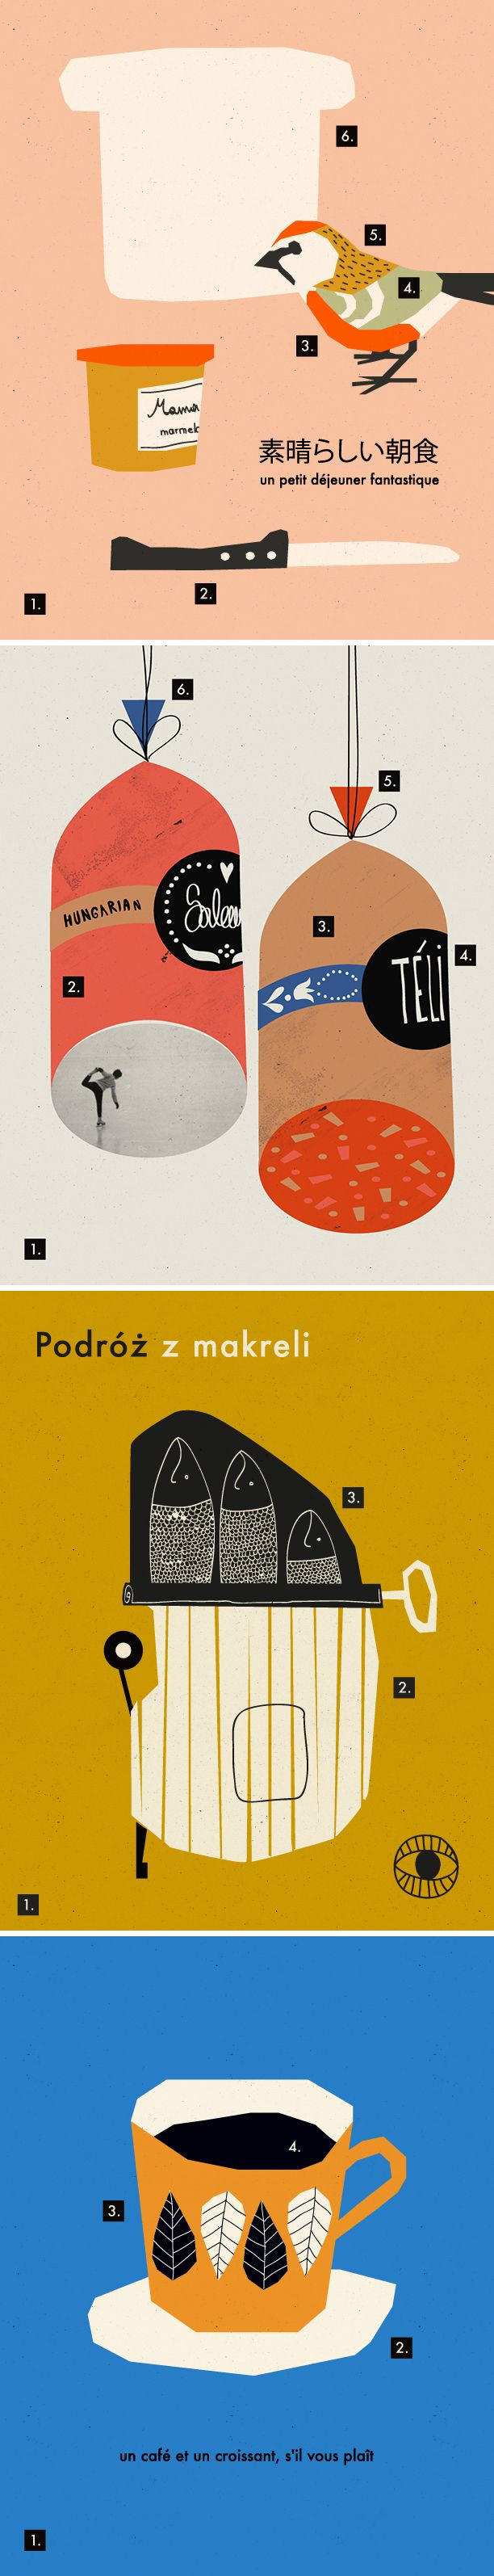 Anna Kövecses, illustration, design, layer, paper cut, screenprint, printmaking, drawing, bird, colour, collage